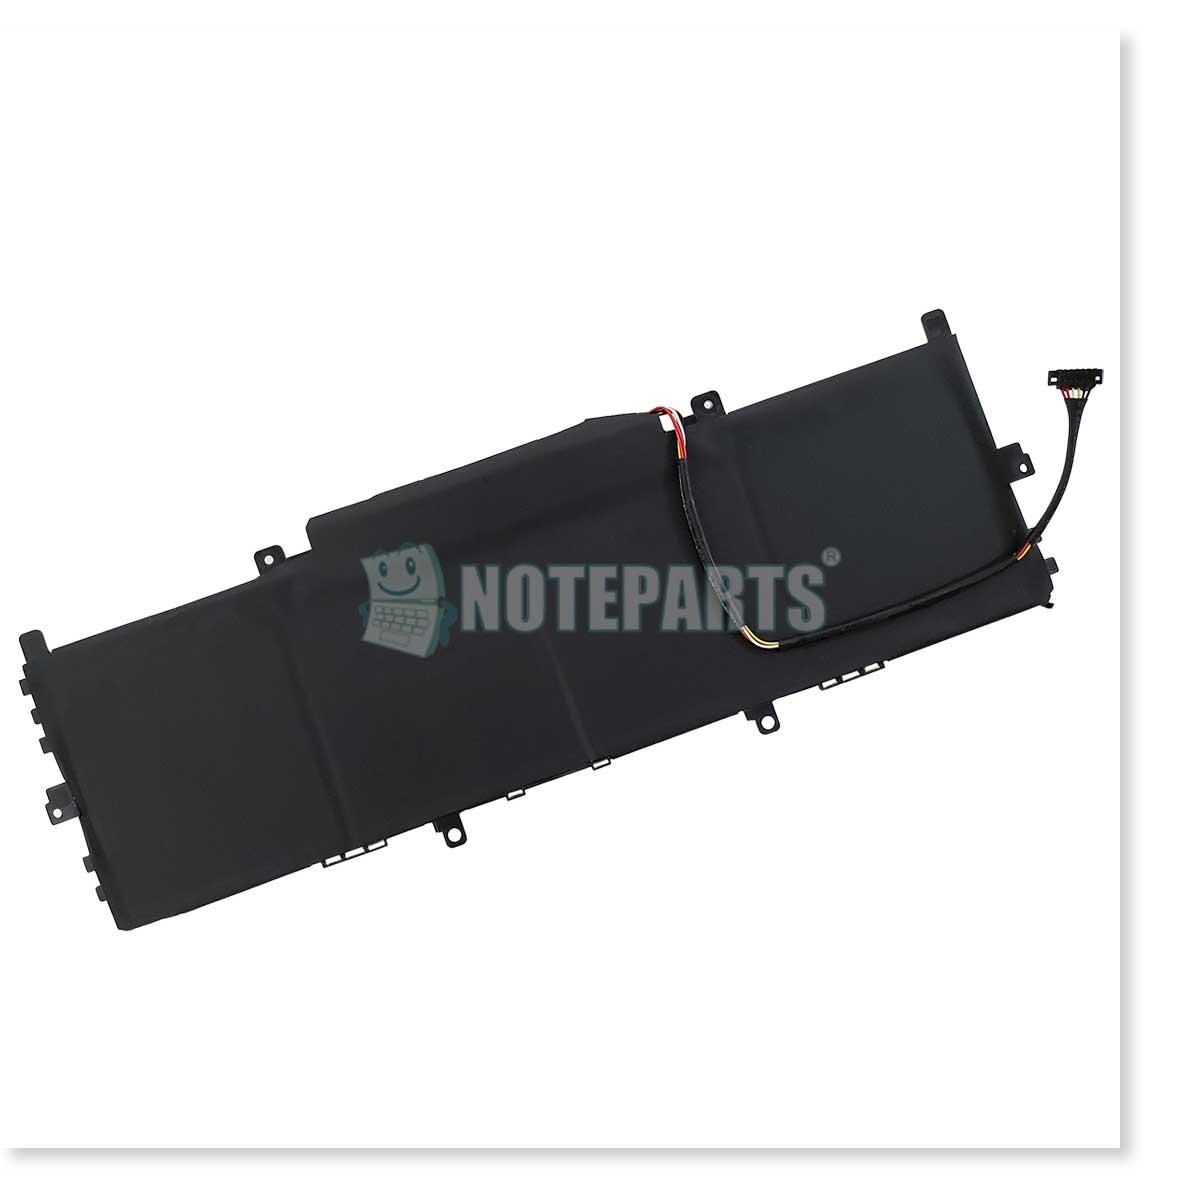 Asus エイスース ZenBook 13 UX331UA UX331UAL バッテリー C41N1715対応